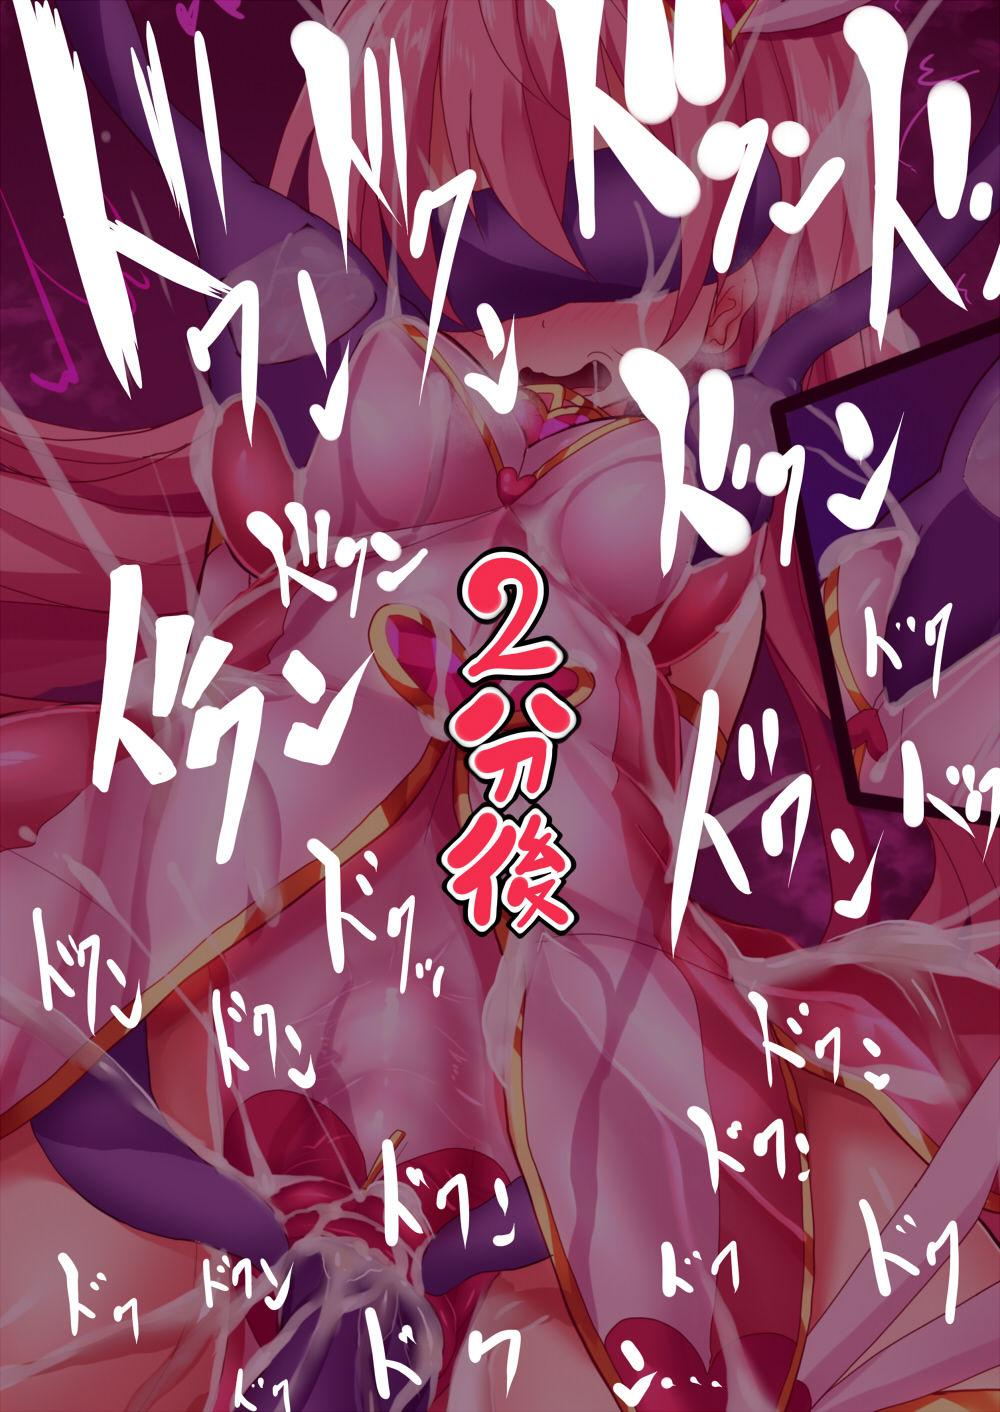 [Makutsutei (Nagai Wataru)] Orgasm Unit EX -Mahou Senshi Akari Ch. 1-5 [Chinese] [这很恶堕 x Lolipoi汉化组] 30